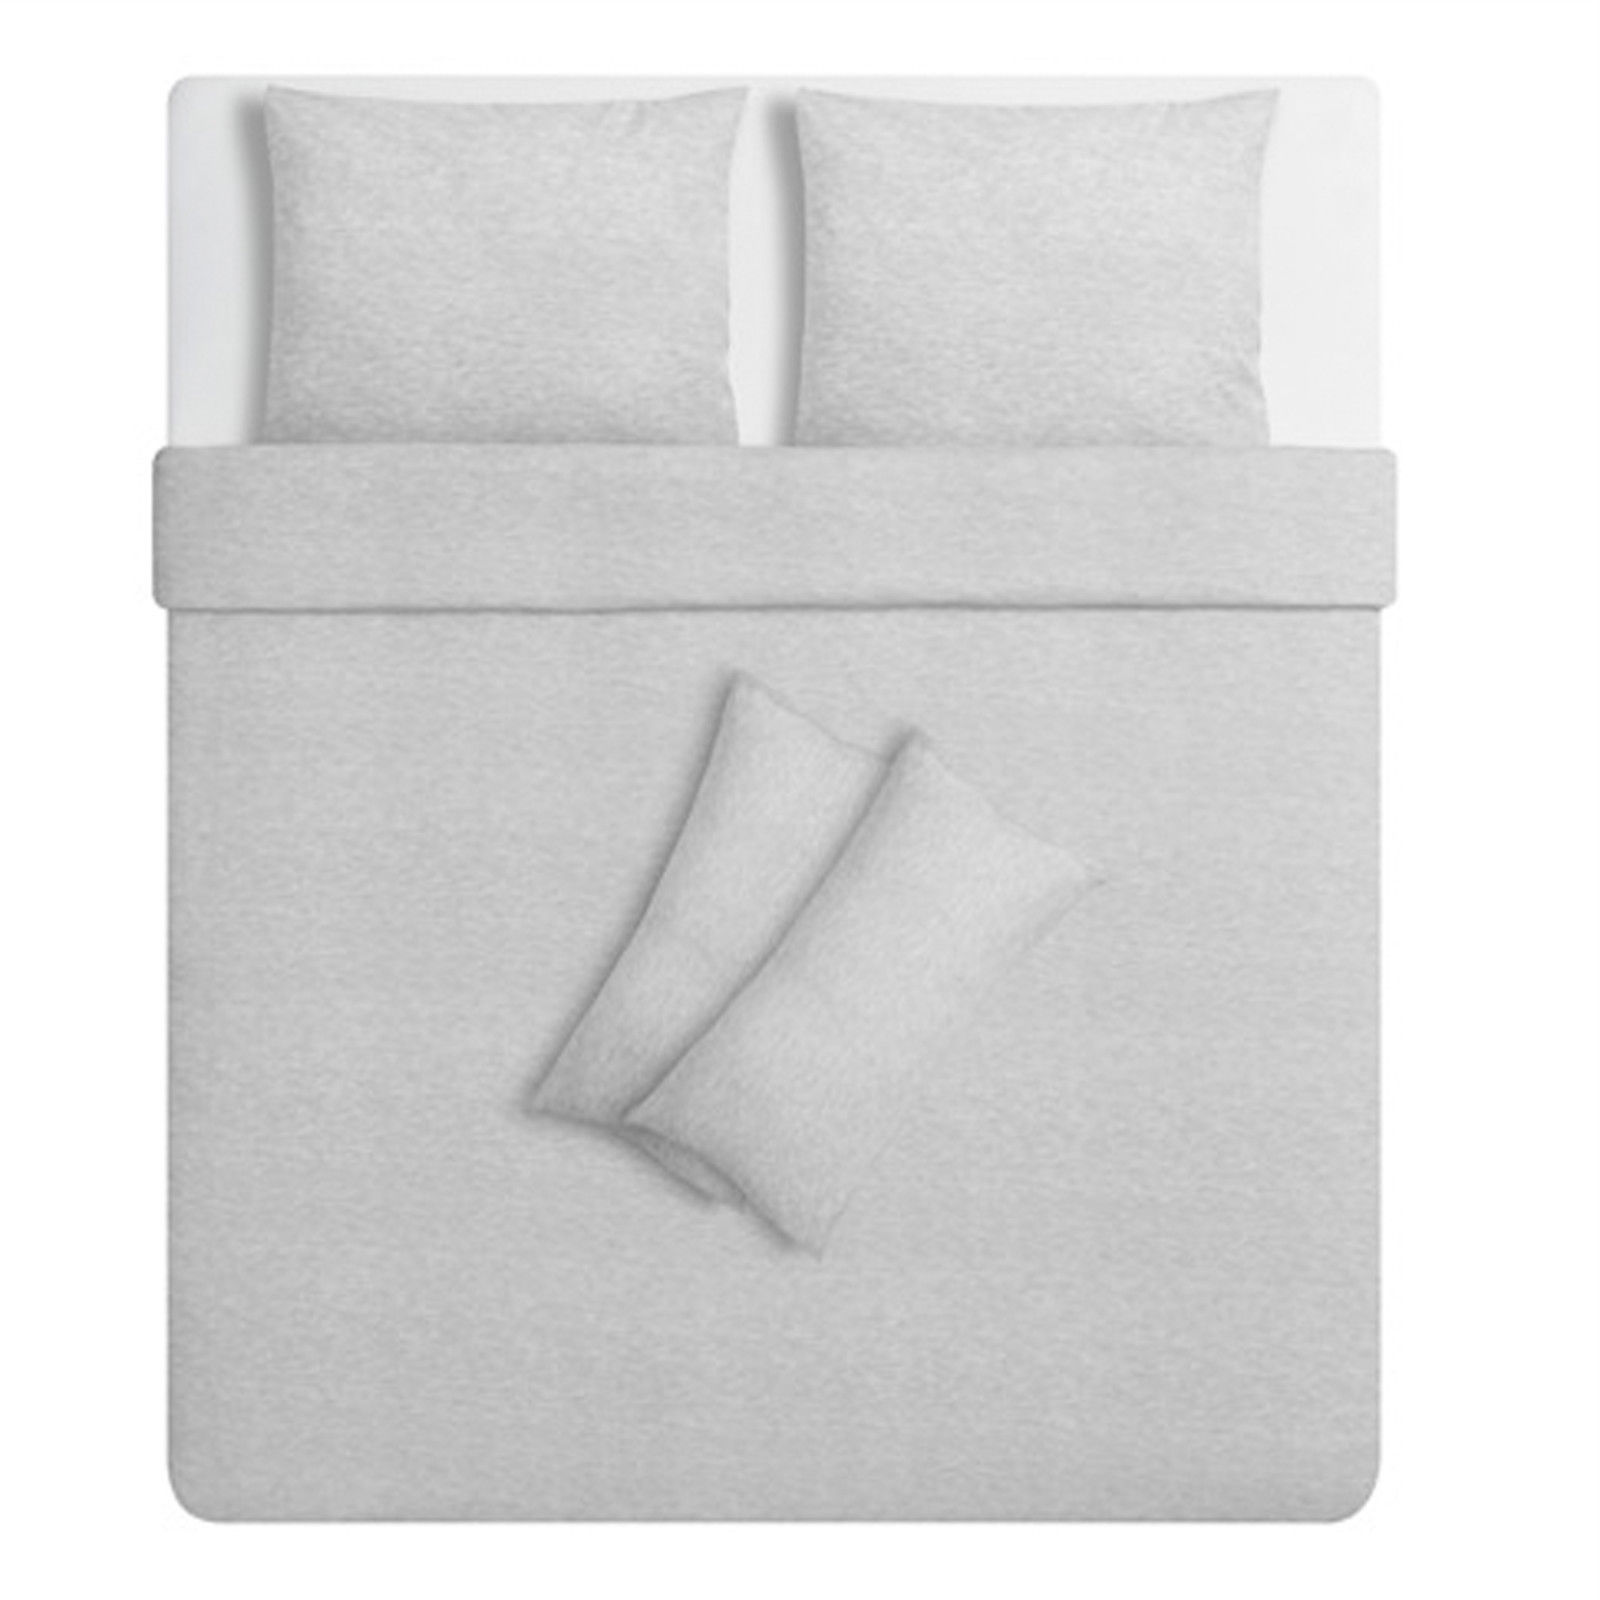 Ikea Bettwasche Bettwascheset Blasstarr 5 Teilig 80 80 Cm 240 220 Cm